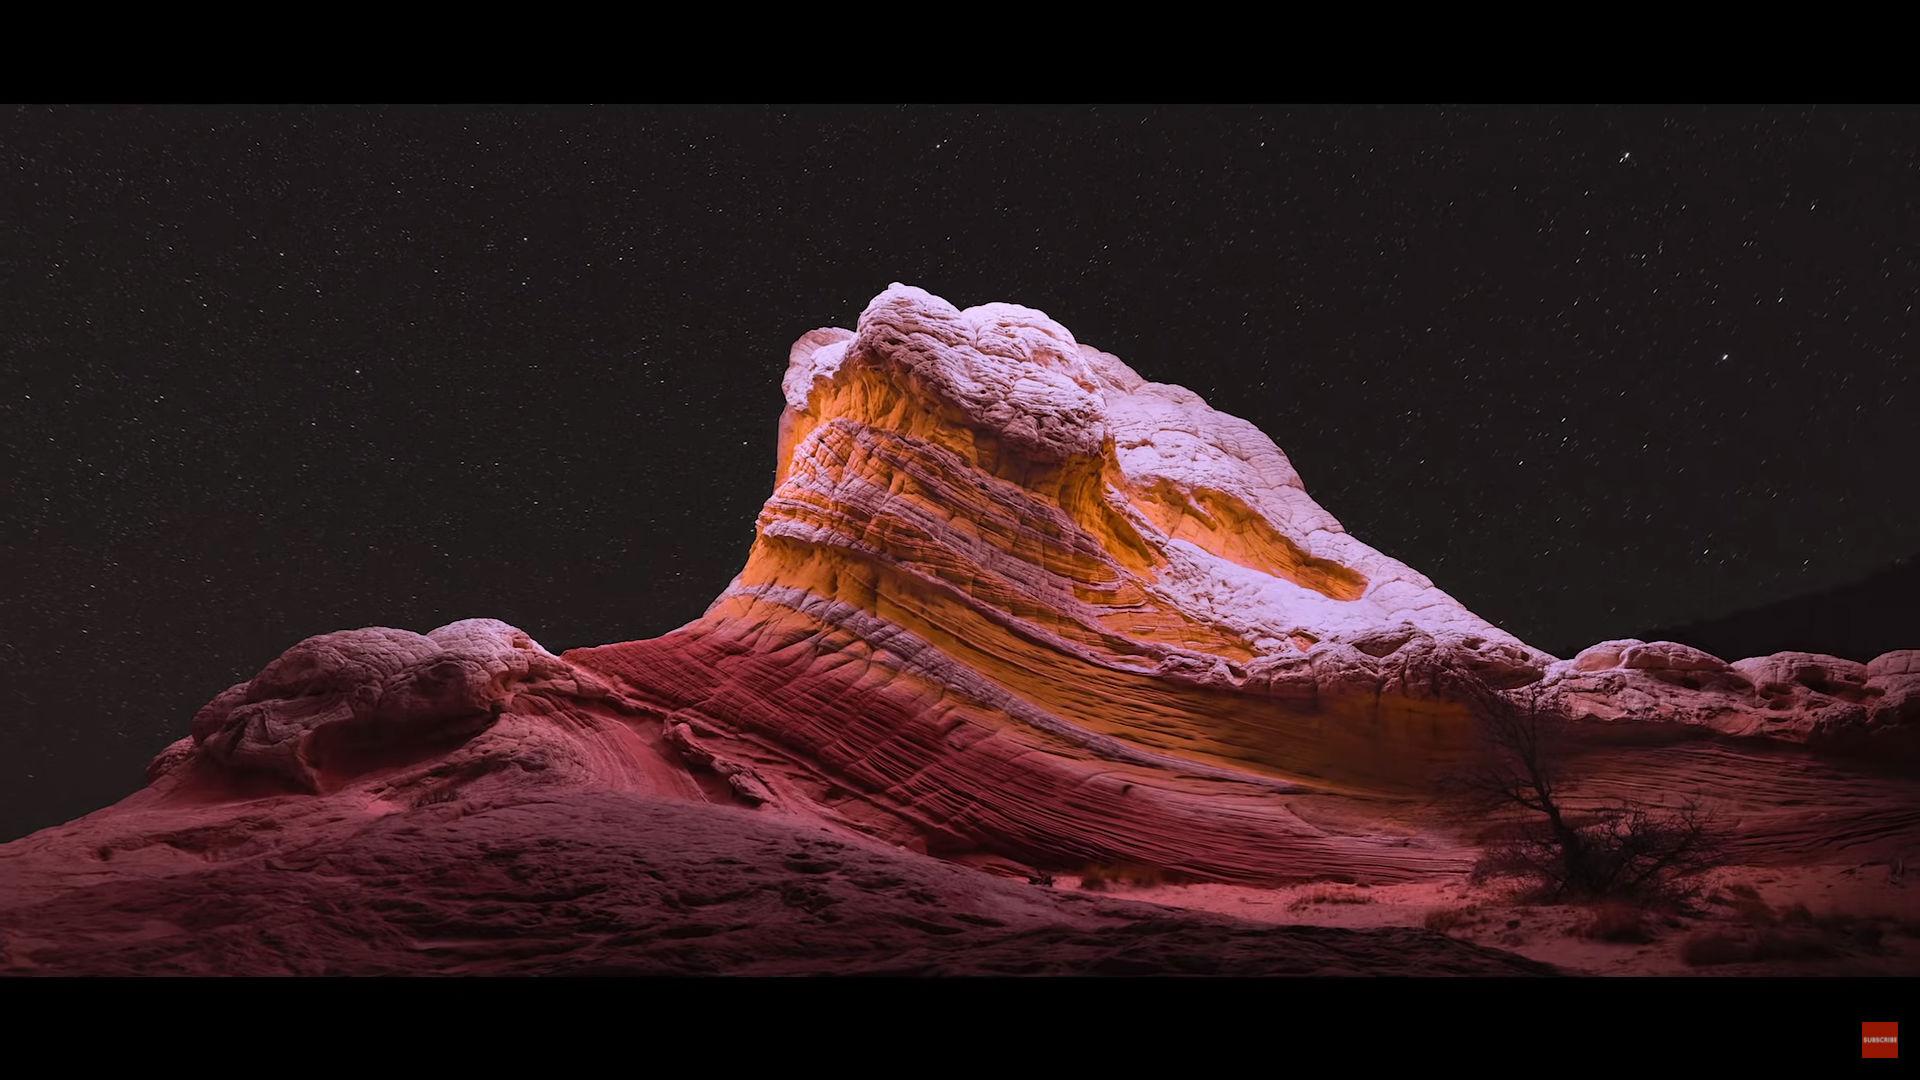 beautiful landscape photography image